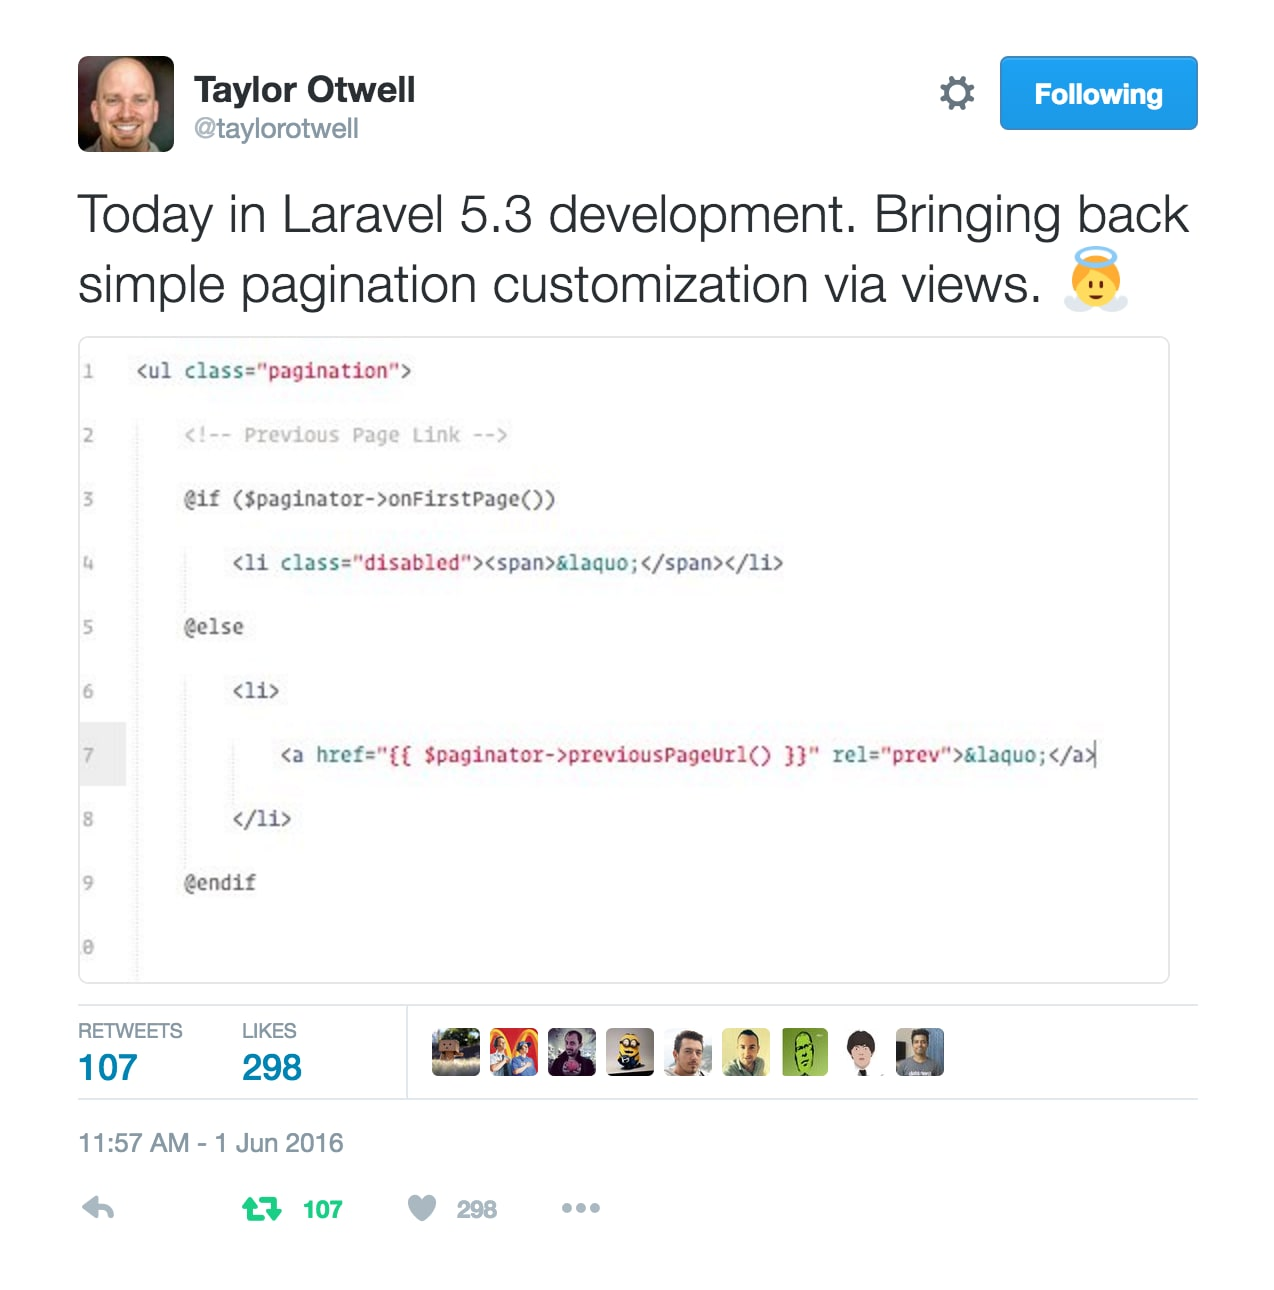 Today in Laravel 5.3 development. Bringing back simple pagination customization via views.